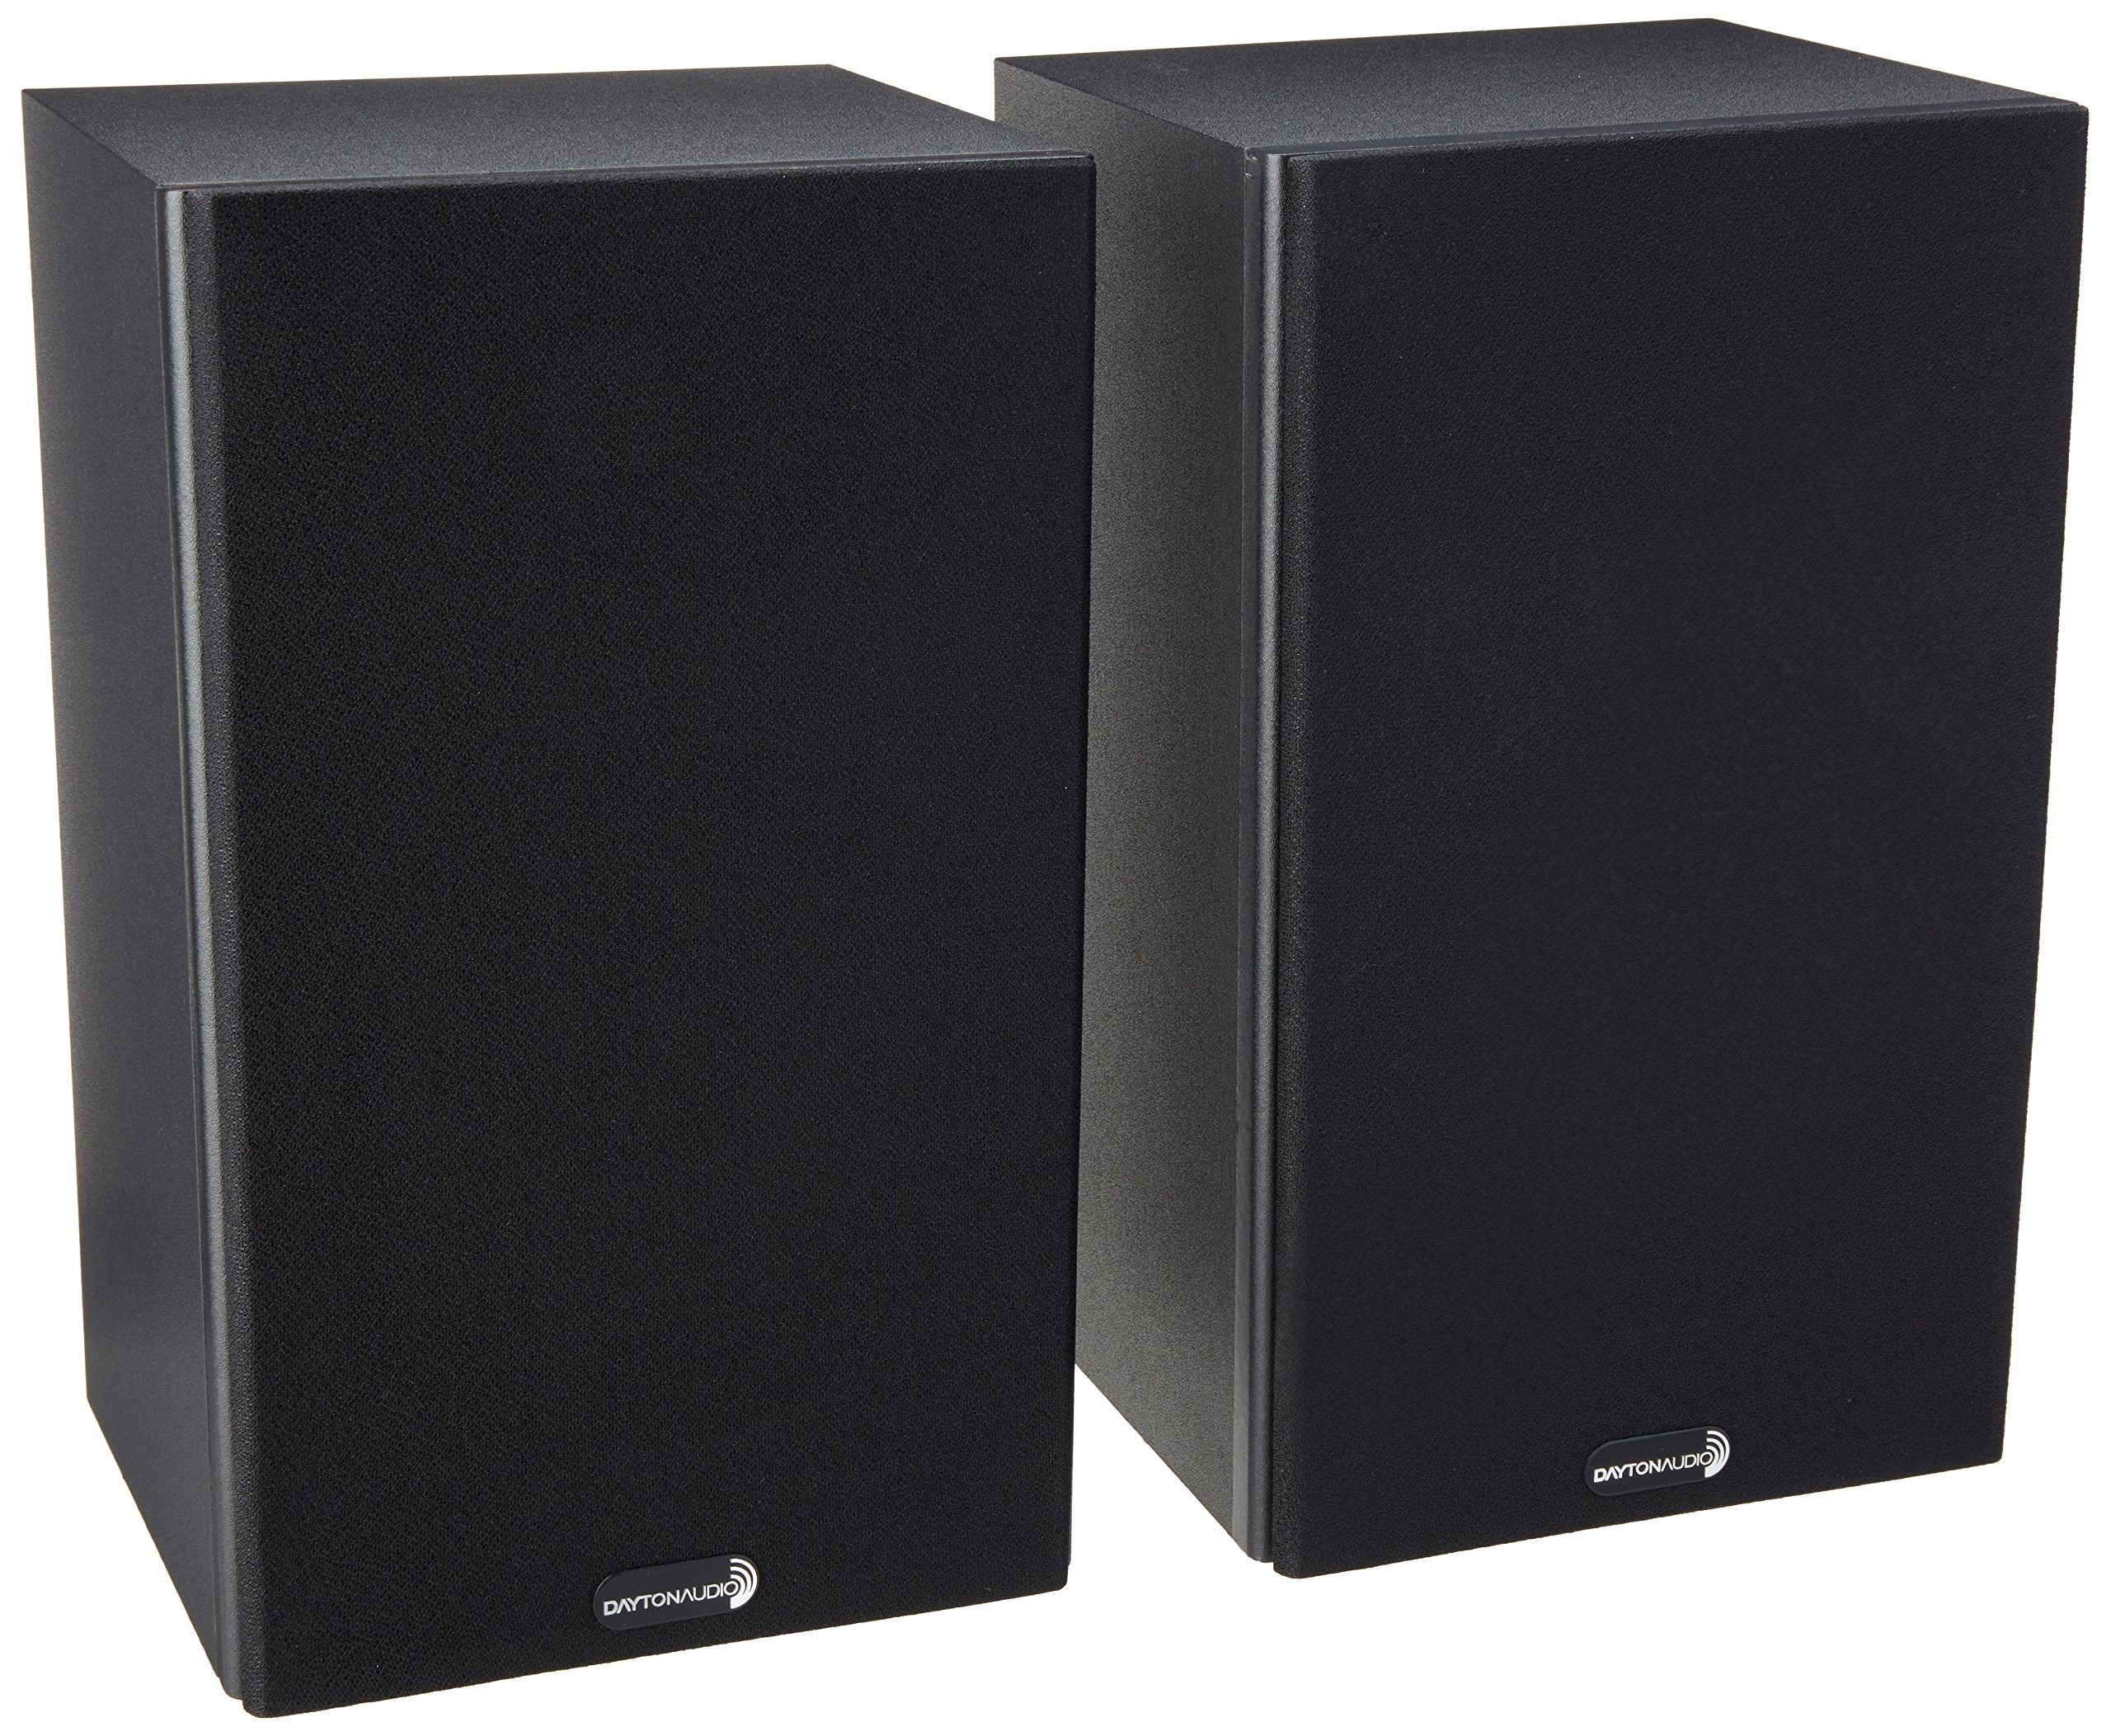 Dayton Audio B652-AIR 6-1/2'' Bookshelf Speaker Pair with AMT Tweeter